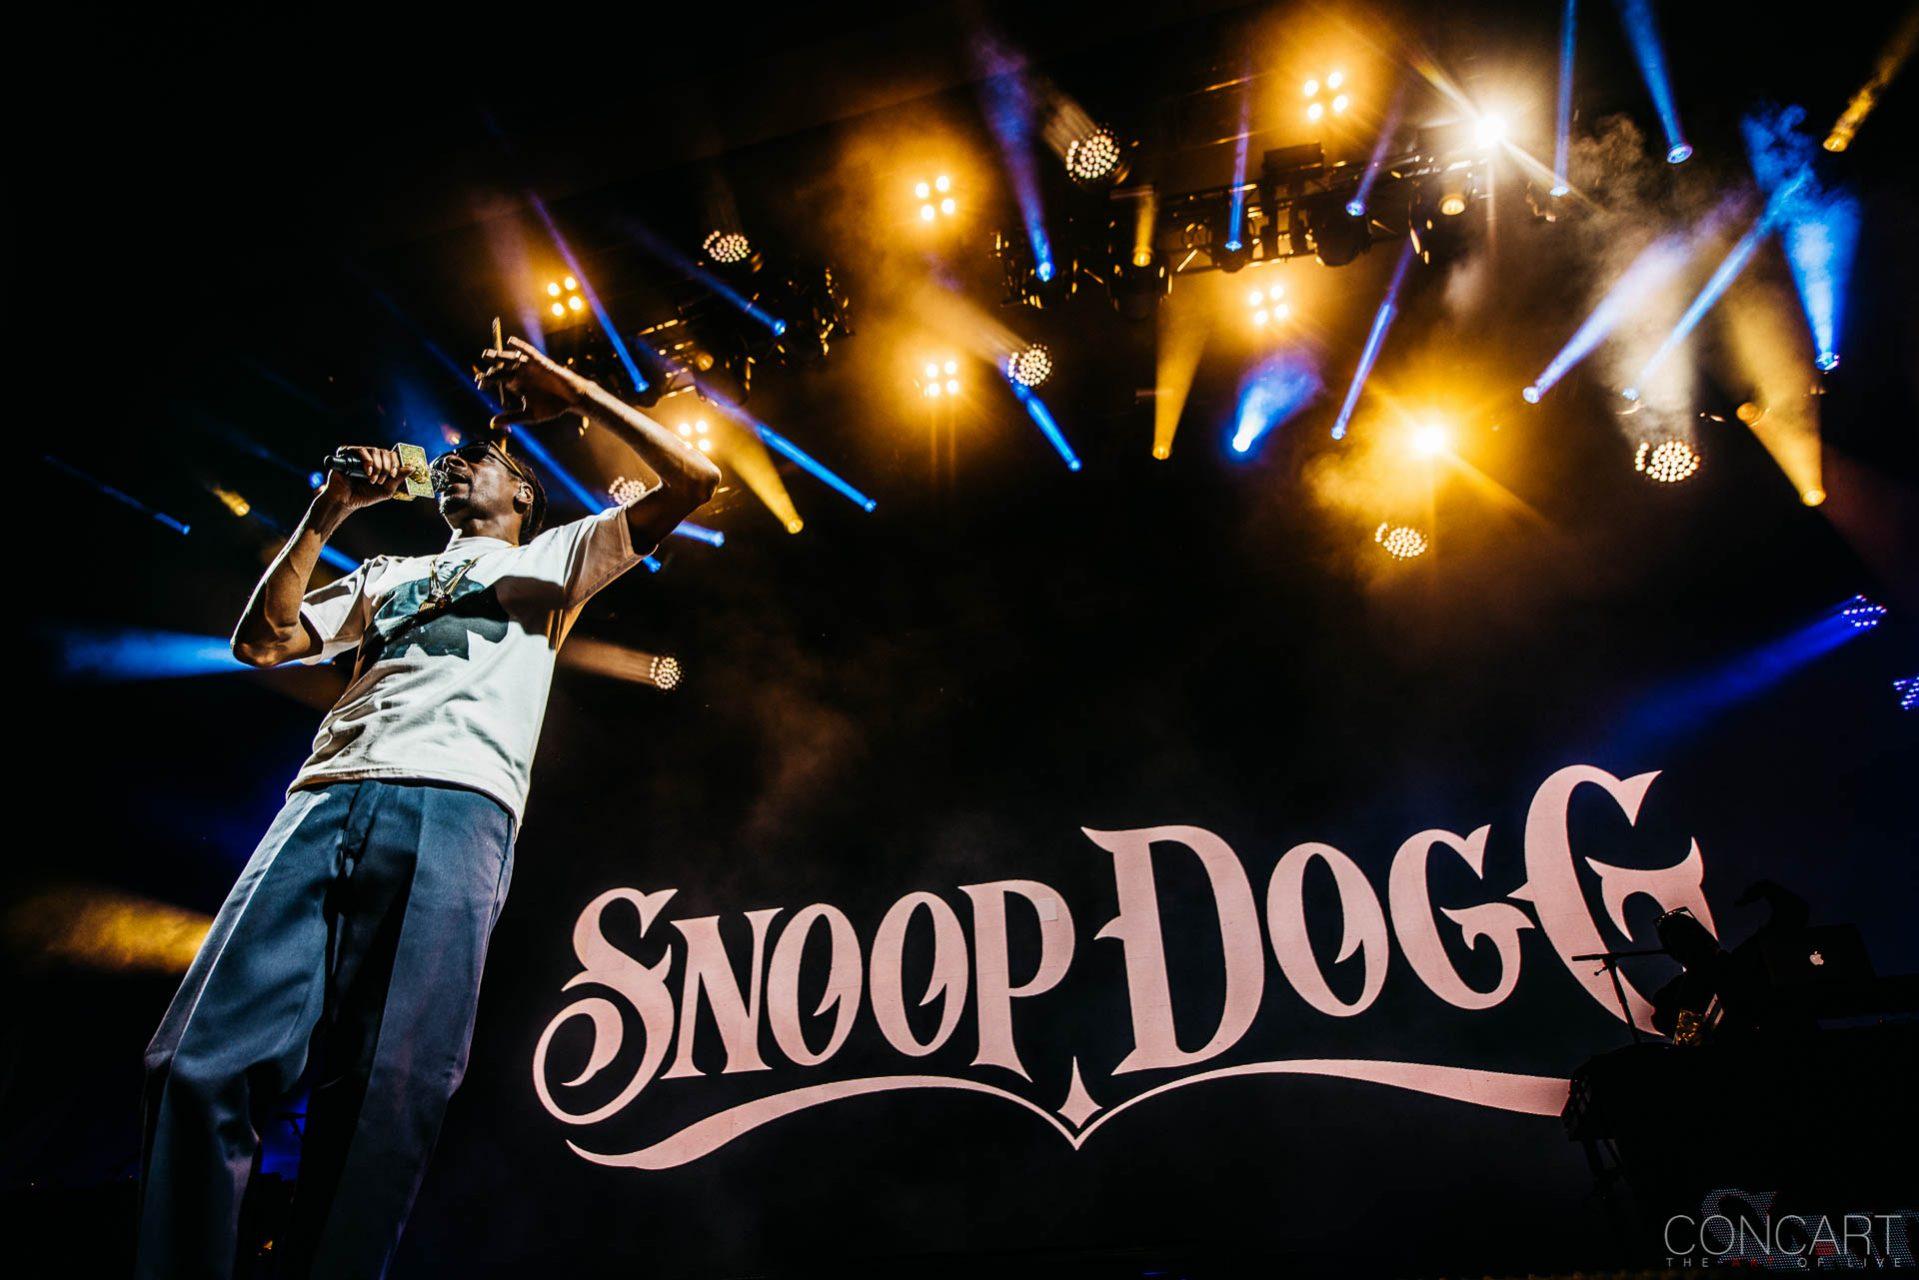 Snoop Dogg photo by Sean Molin 1